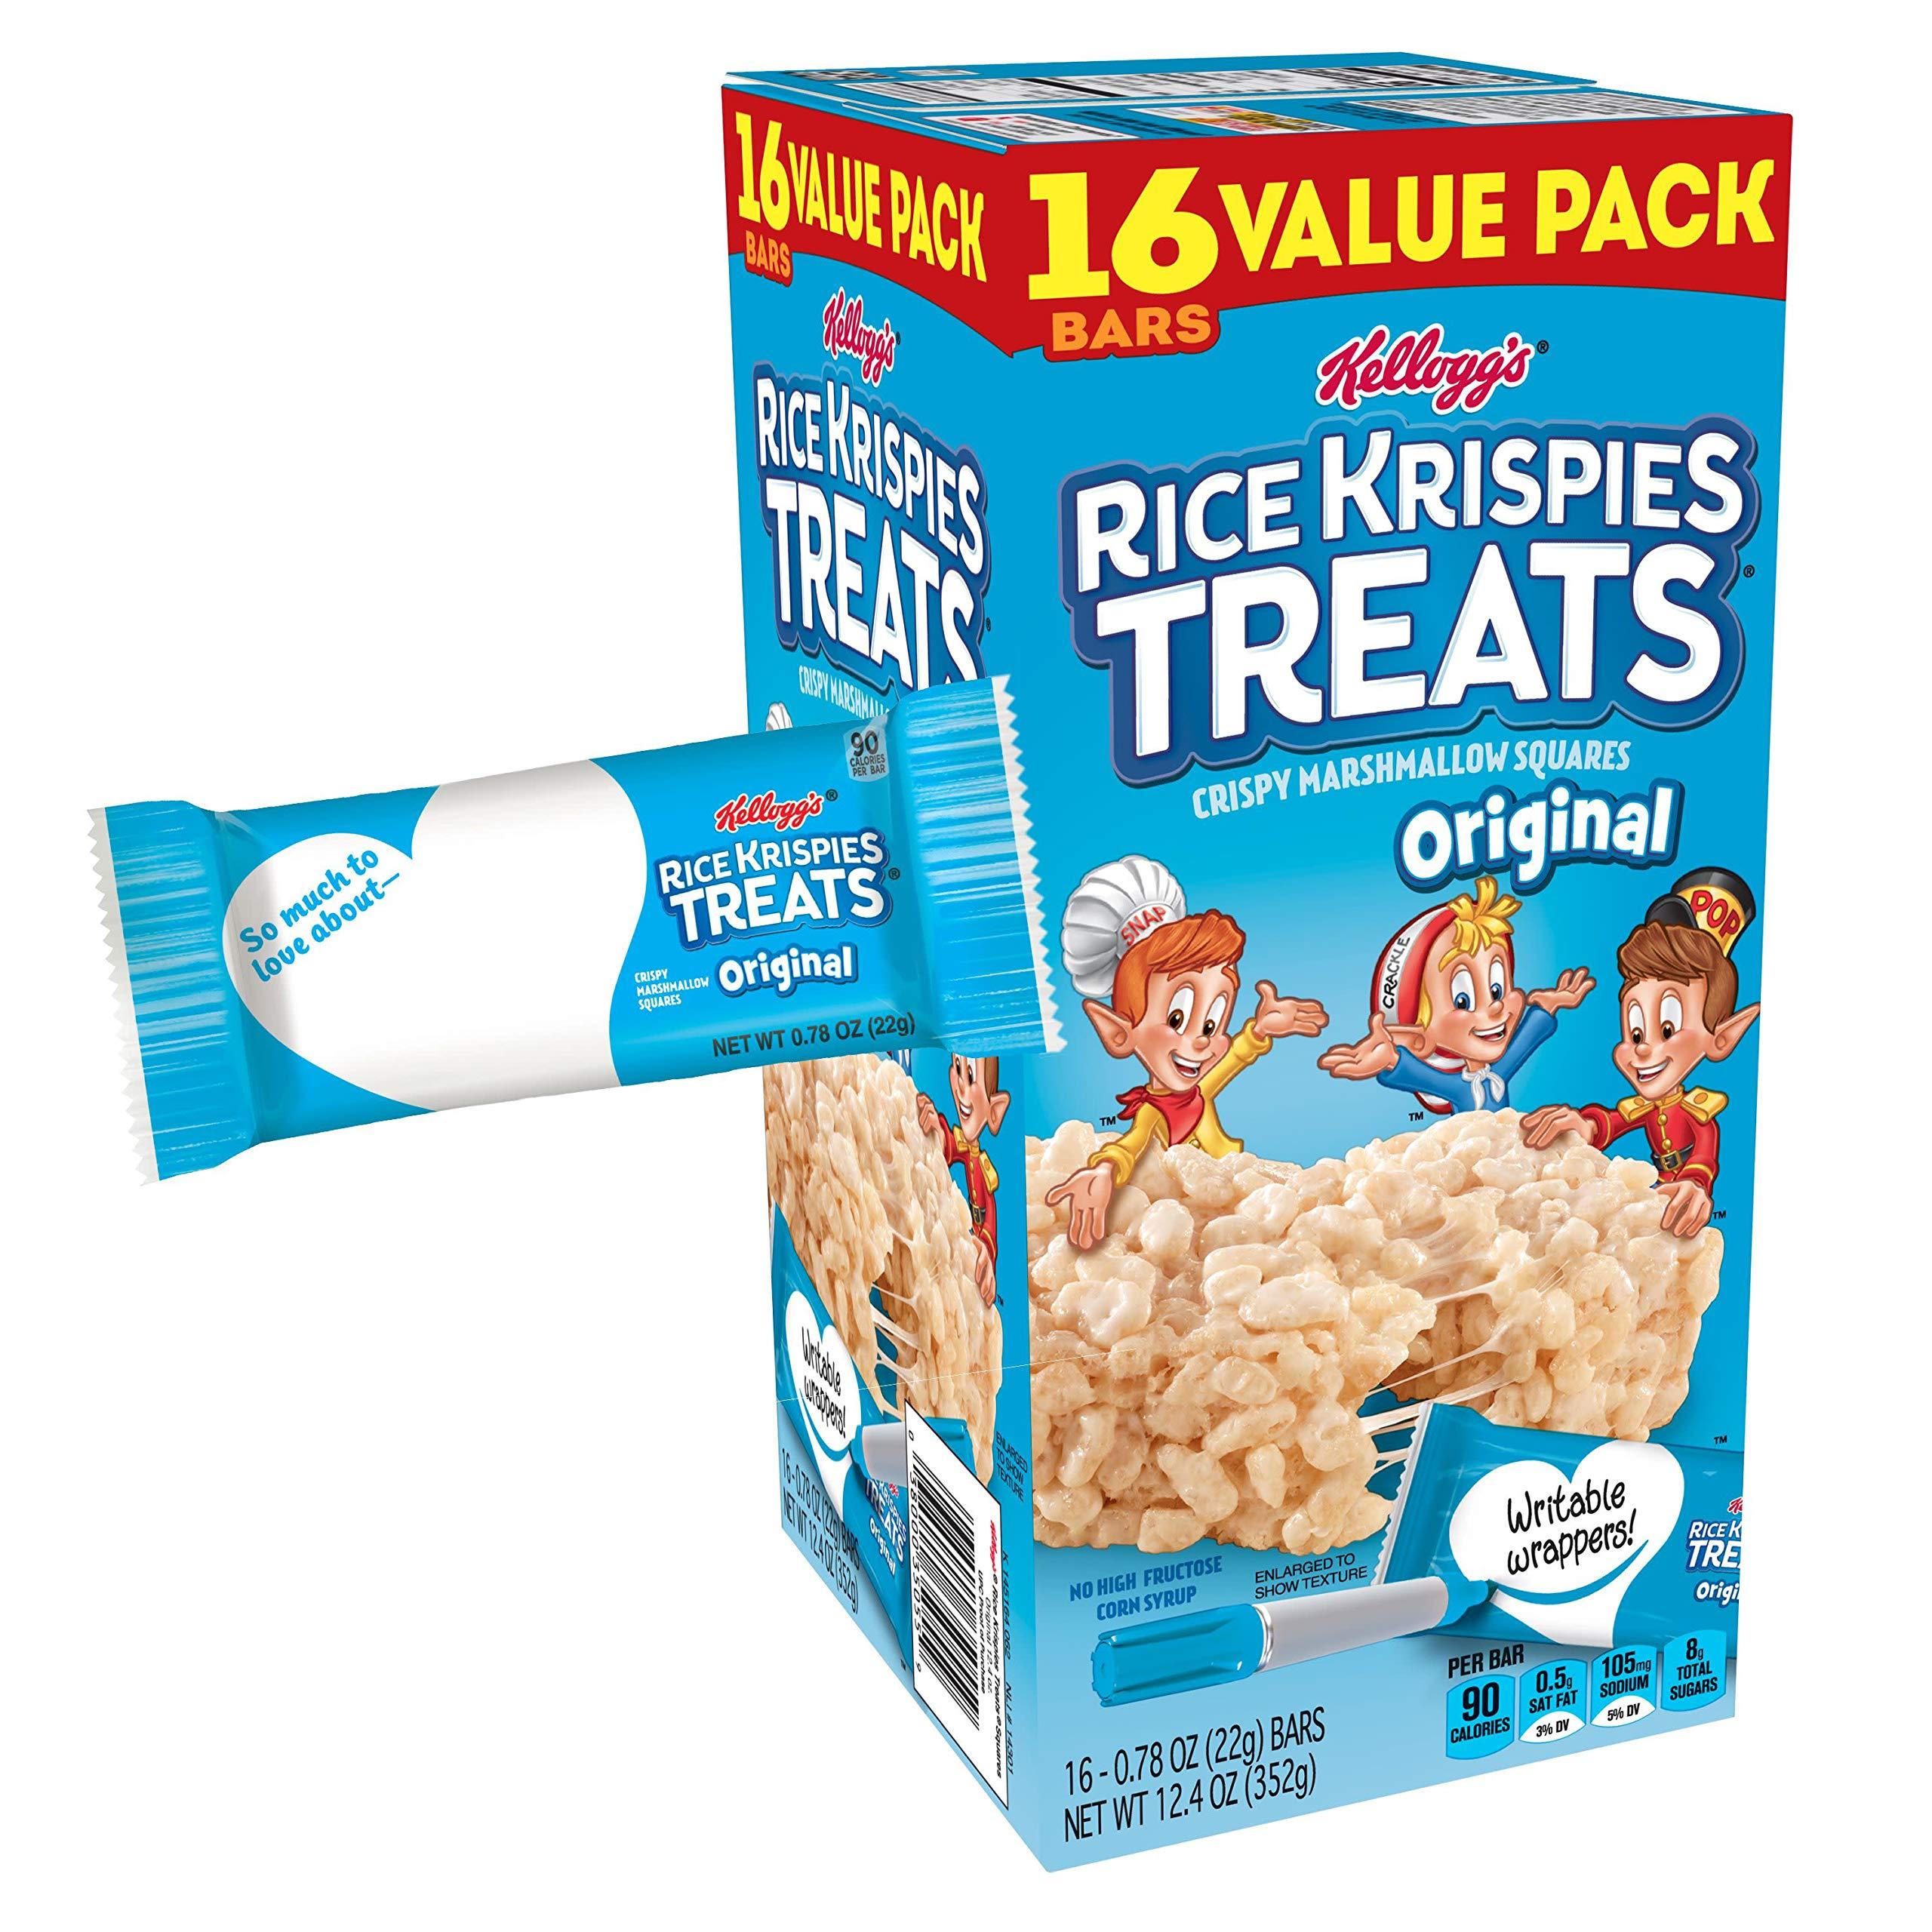 Kellogg's Rice Krispies Treats, Crispy Marshmallow Squares, Original, Value Pack, 0.78 oz Bars(16 Count) by Rice Krispies (Image #4)